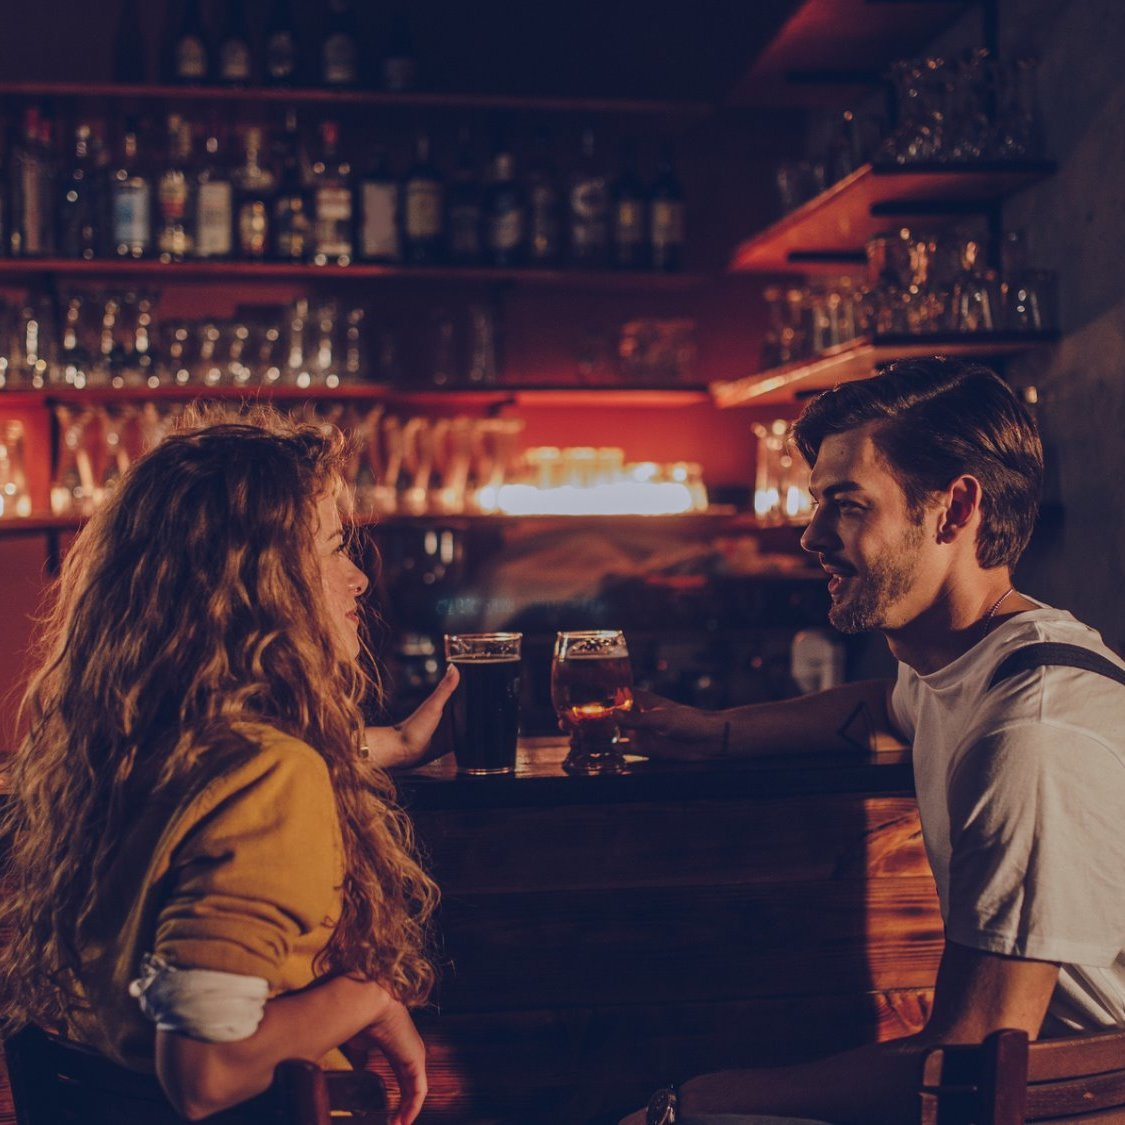 bar rencontre celibataire lyon rencontre telephone maroc